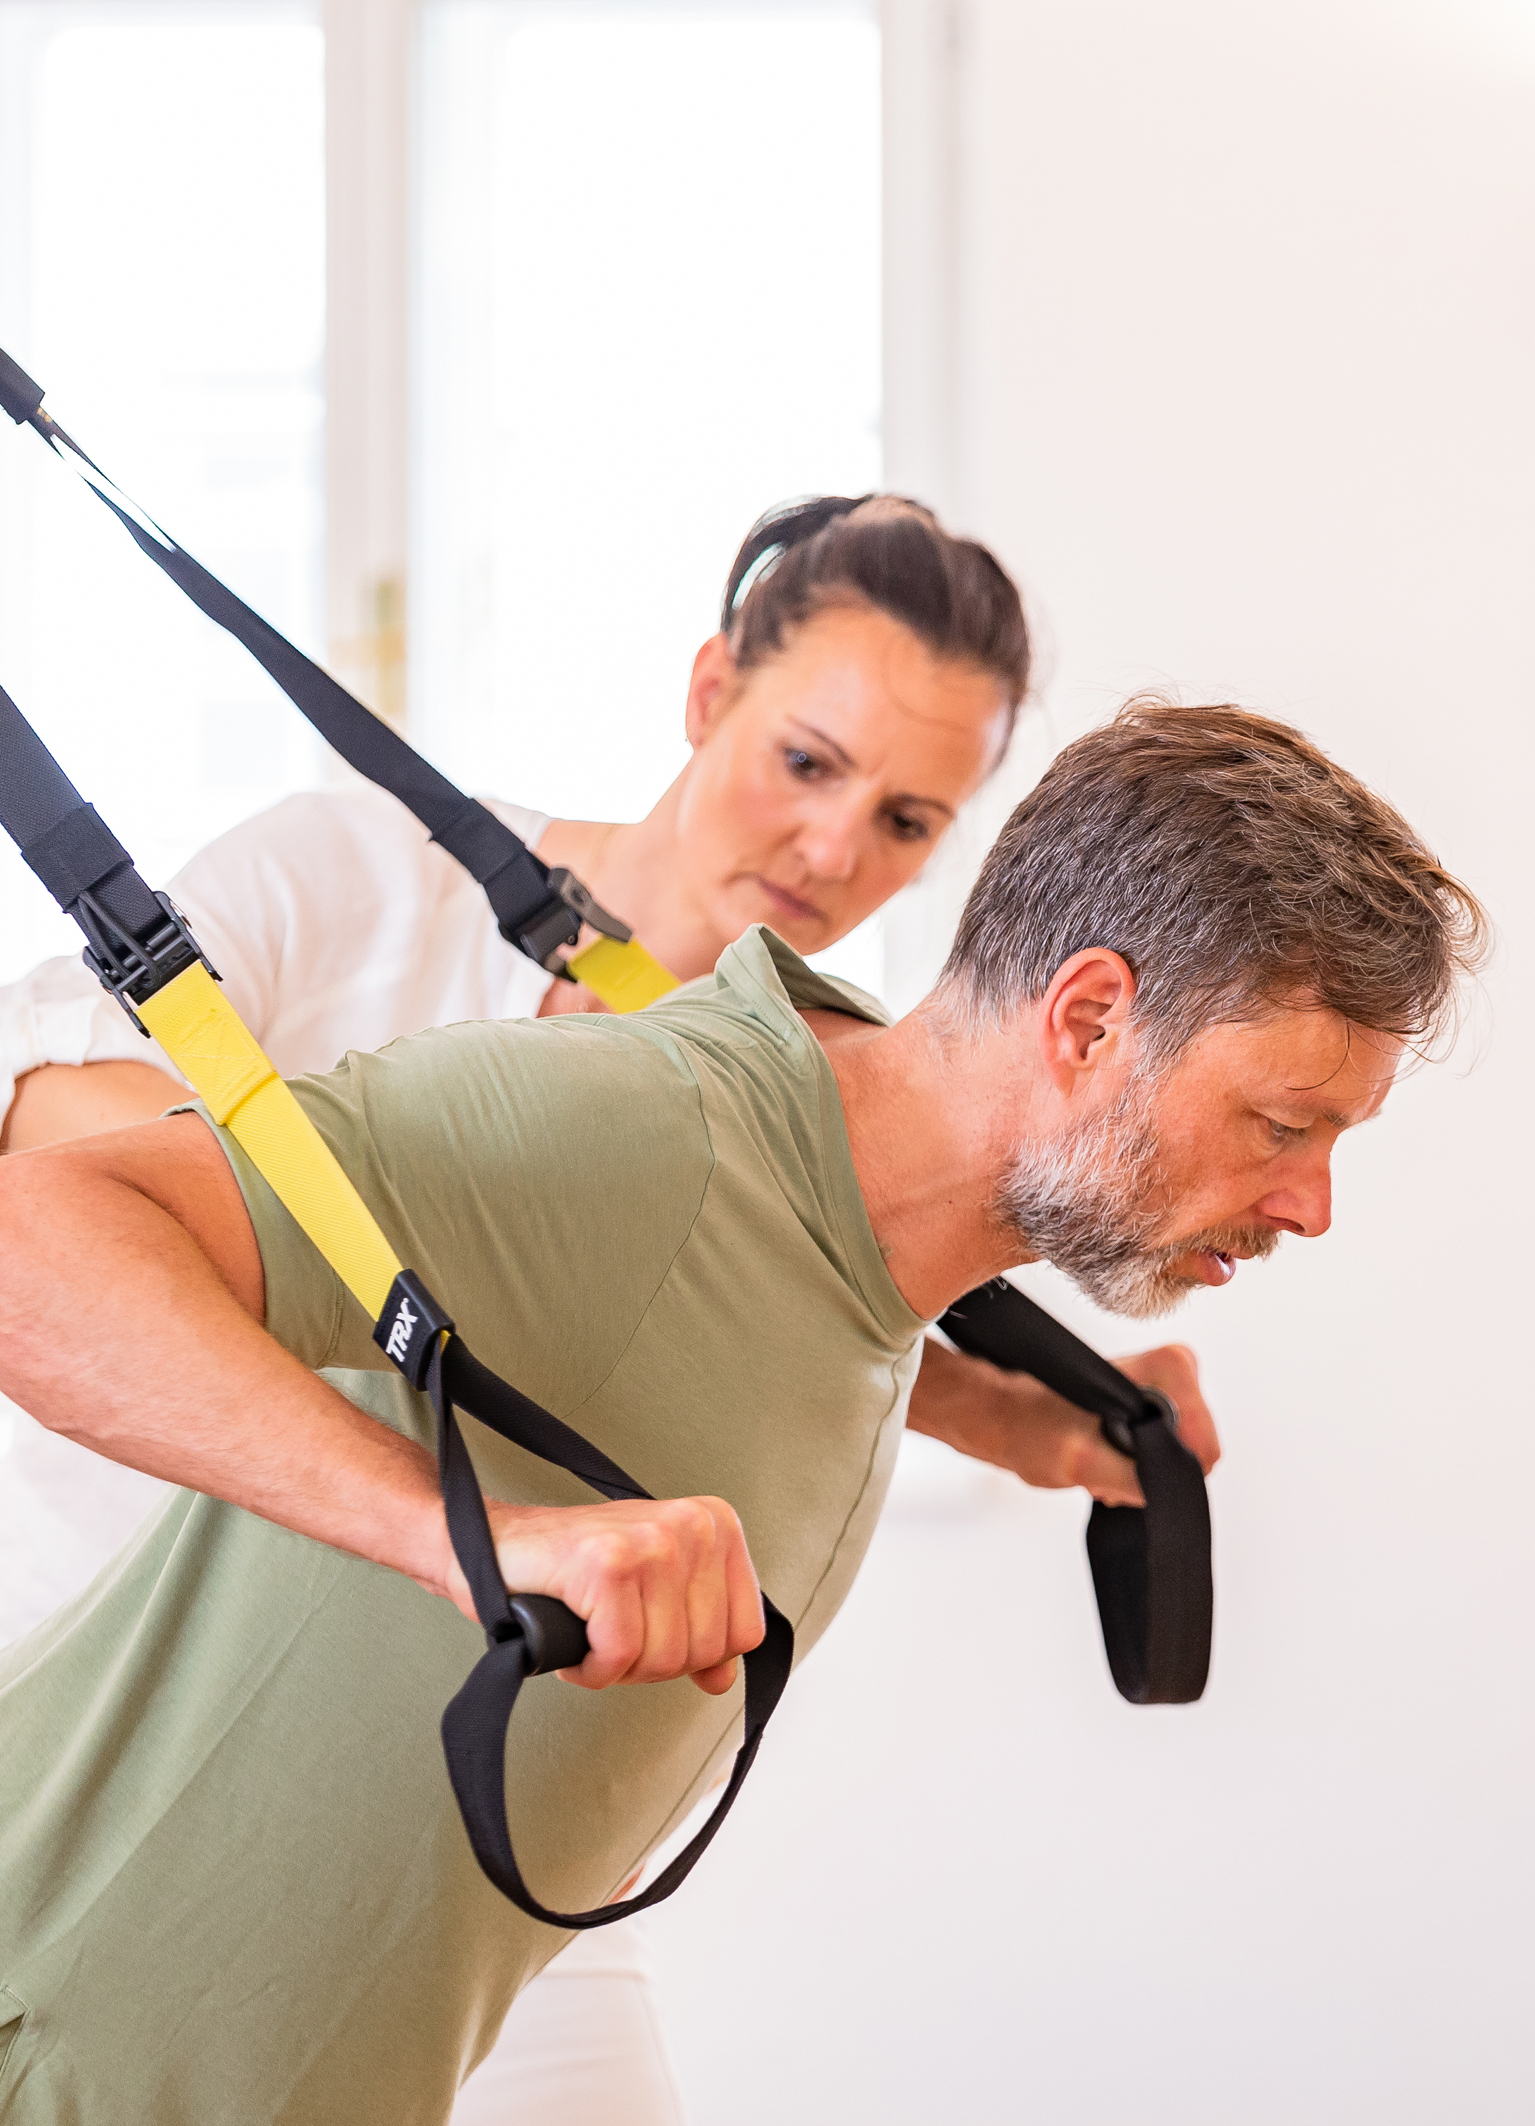 praxis_sykora_therapie-yoga-training_waidhofen_ludwigfahrnberger_physio